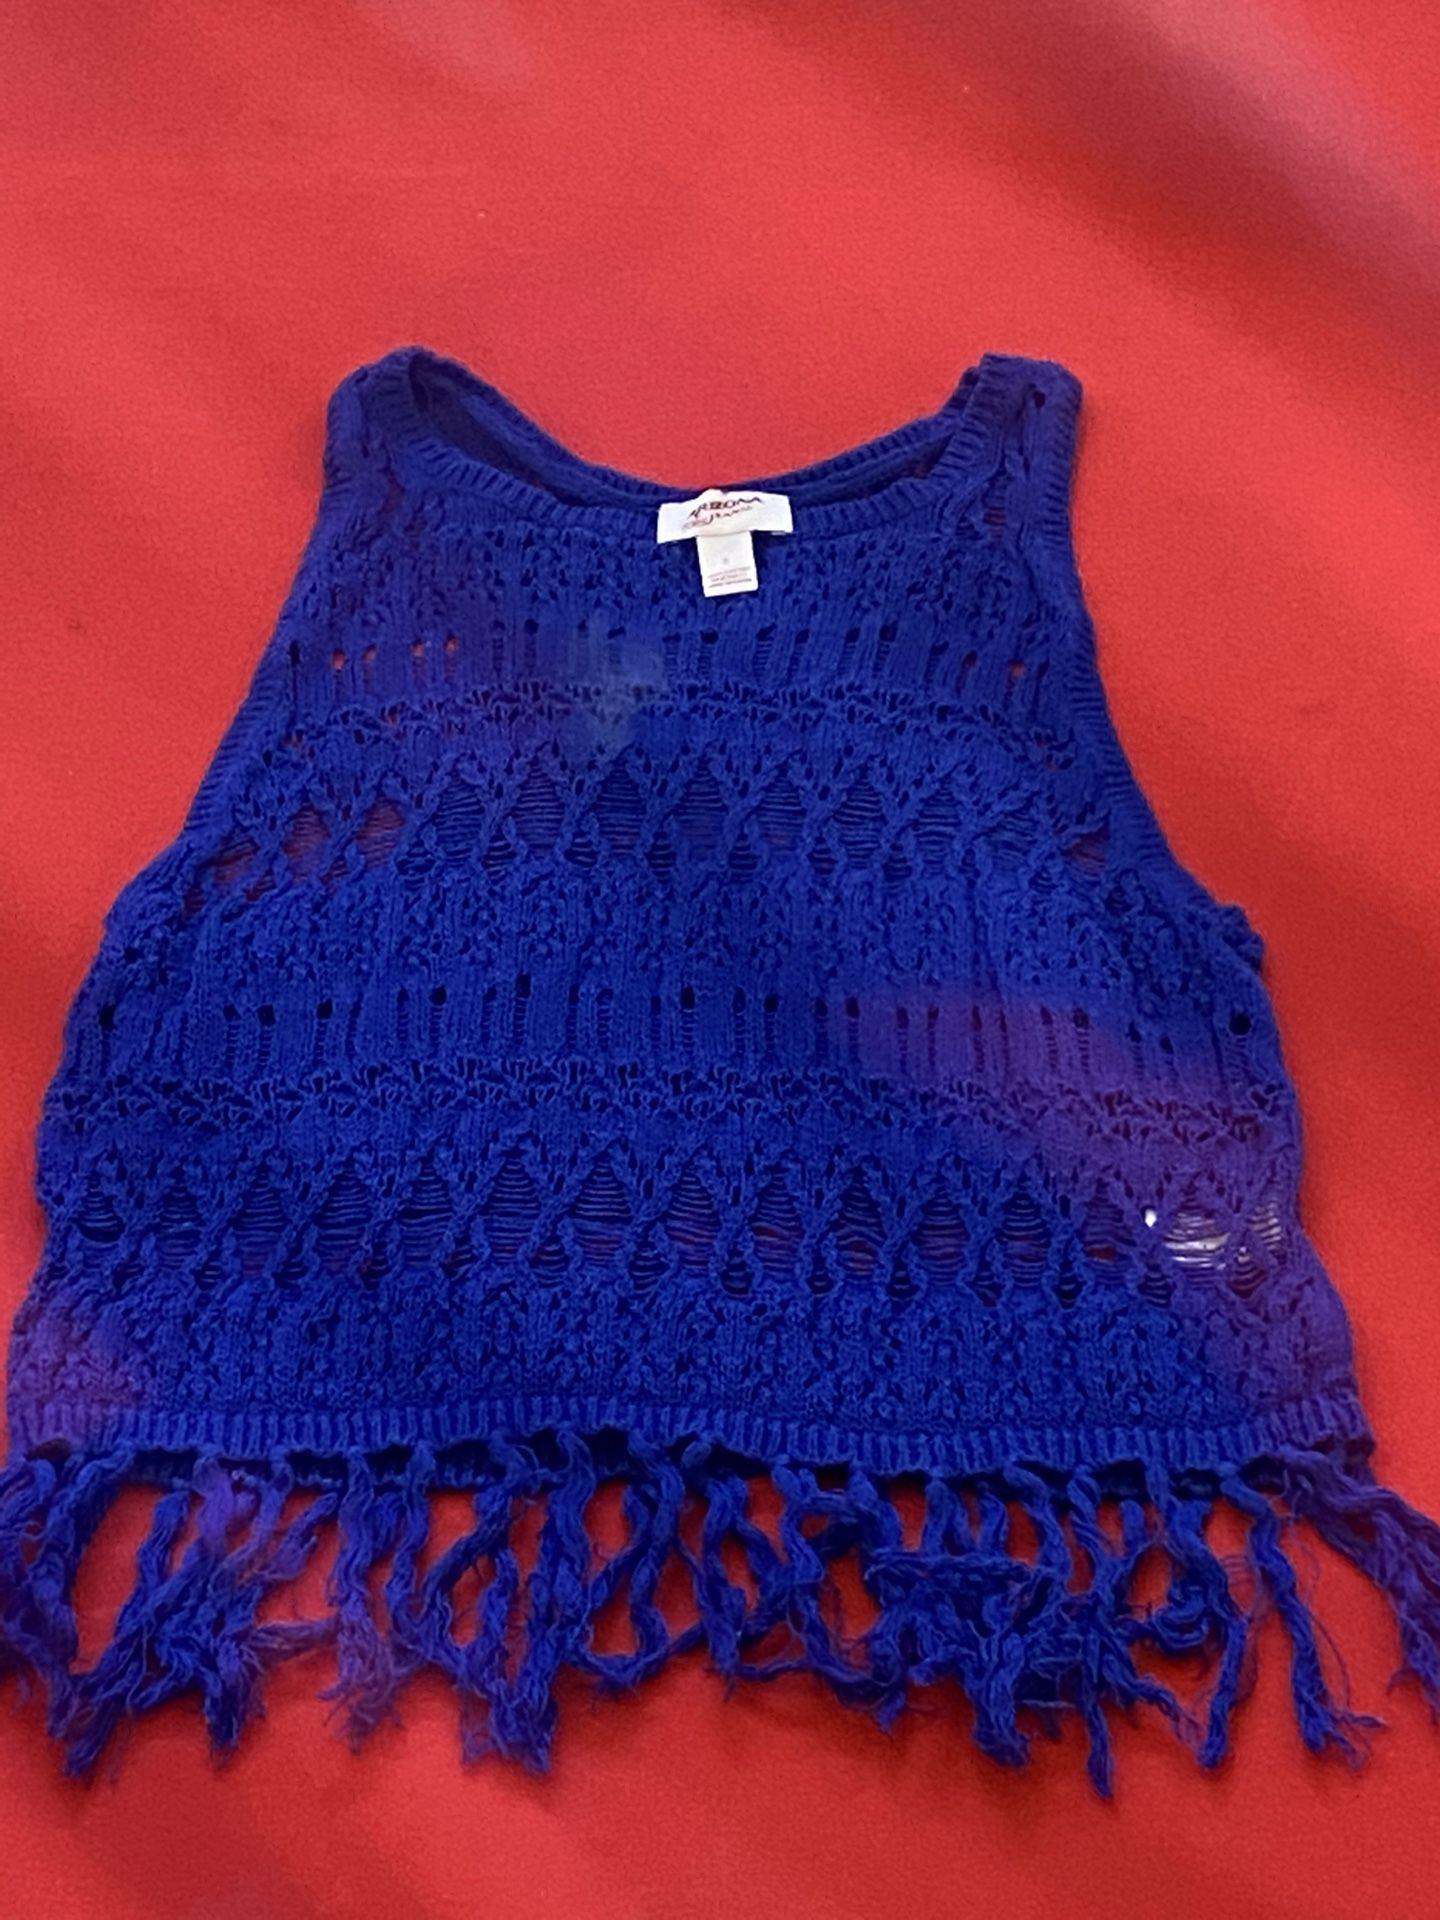 Royal Blue knit tank top with fringe bottom